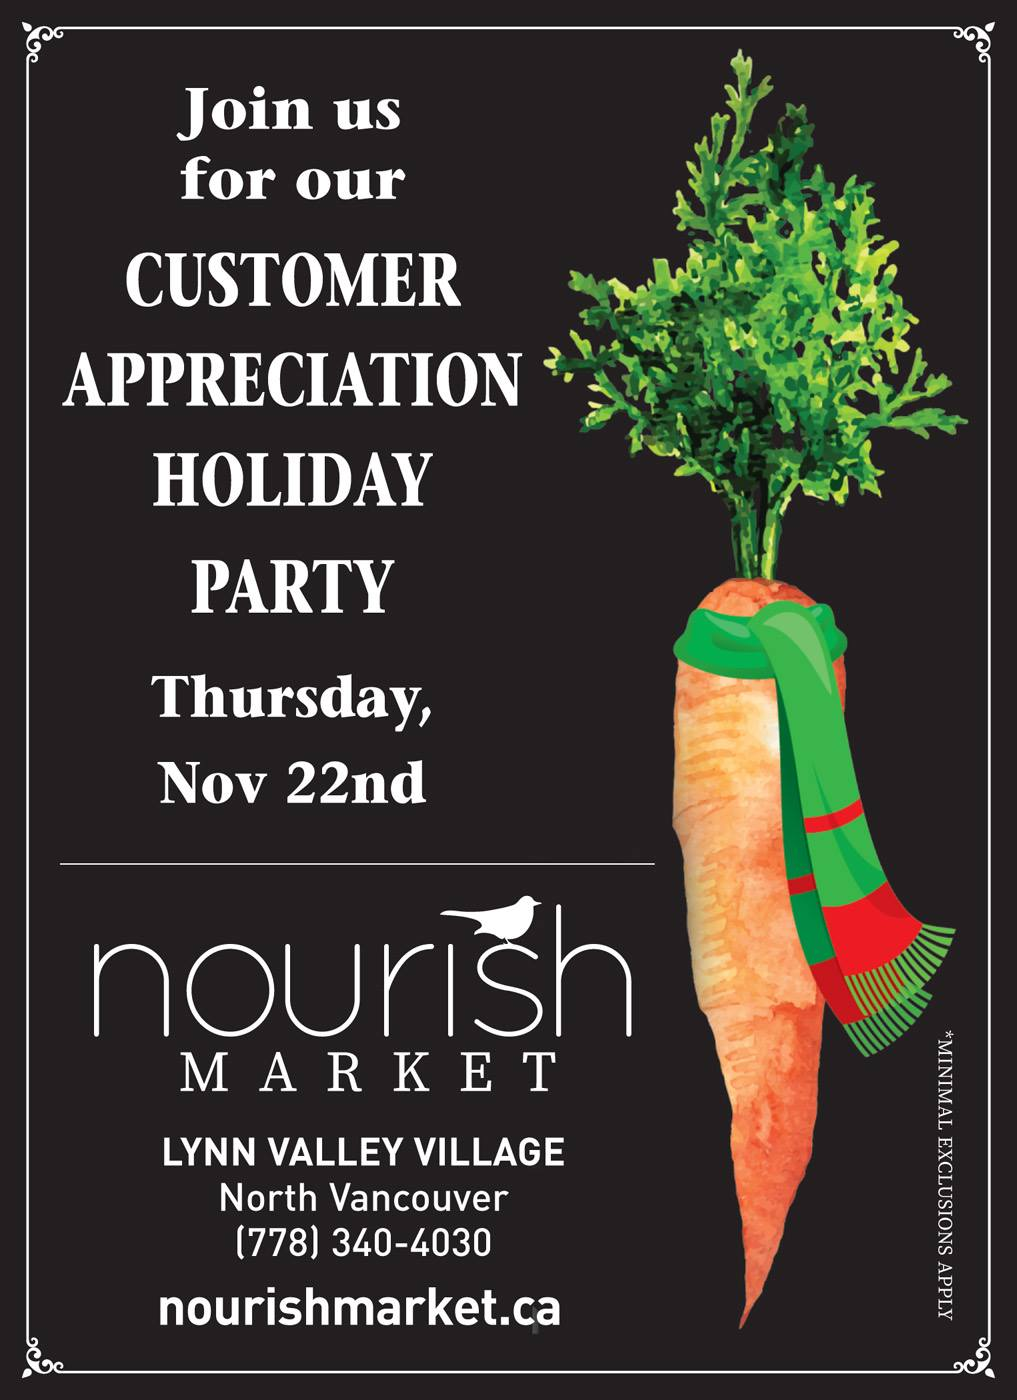 customerappreciationday Nourish